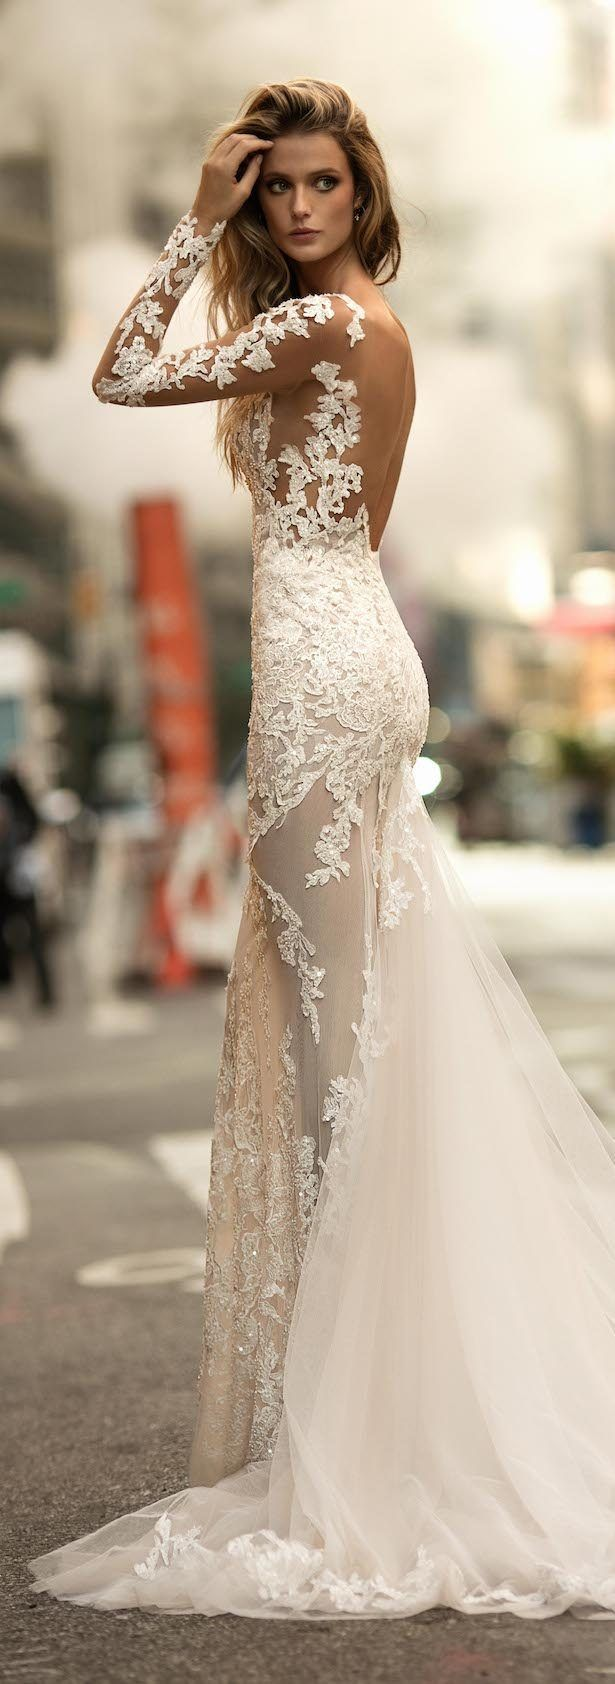 Best 25+ Tight wedding dresses ideas on Pinterest | White bridal ...